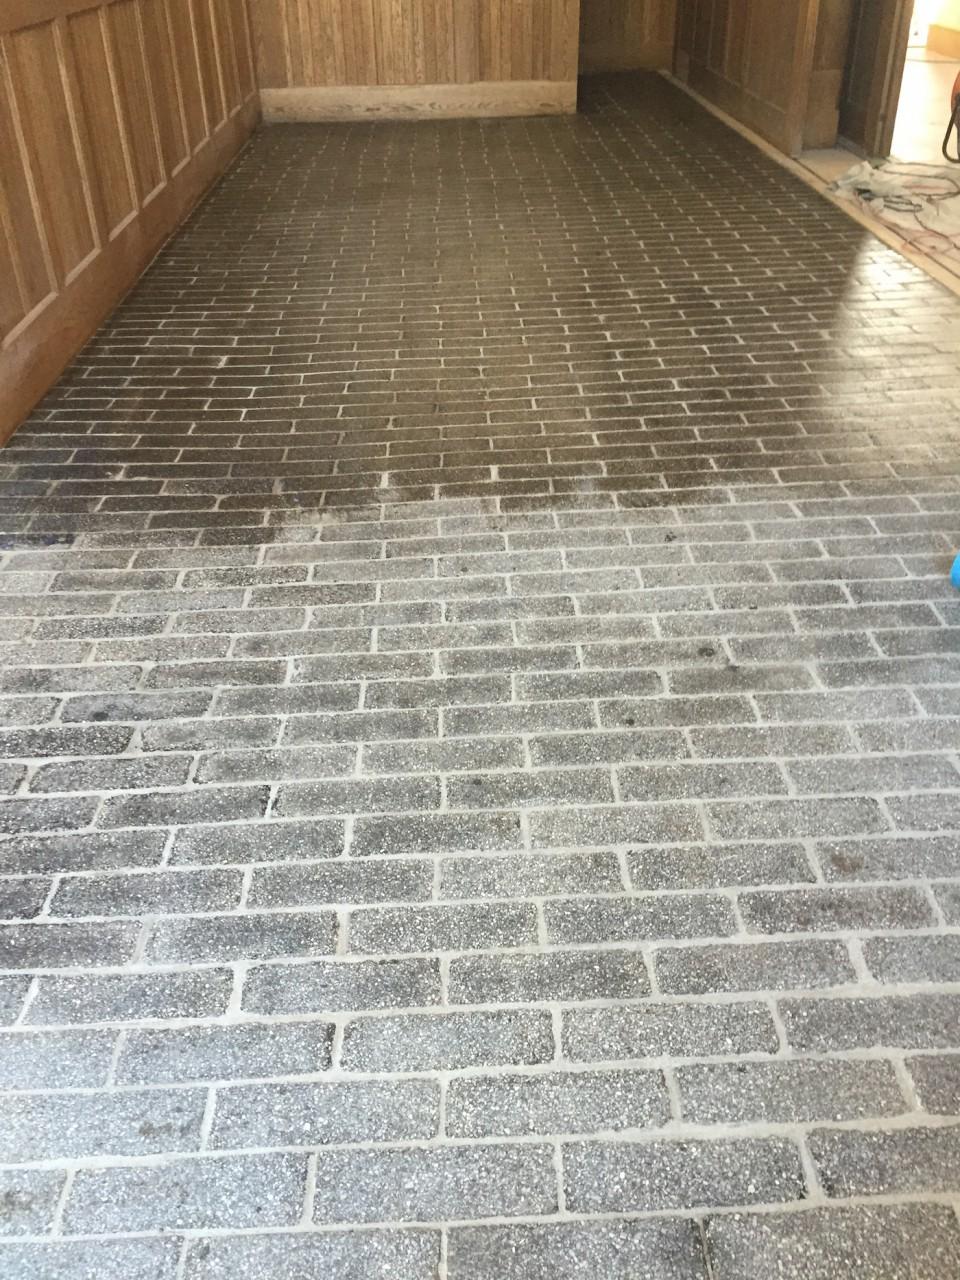 Restoring and polishing pavers in Newport, RI.